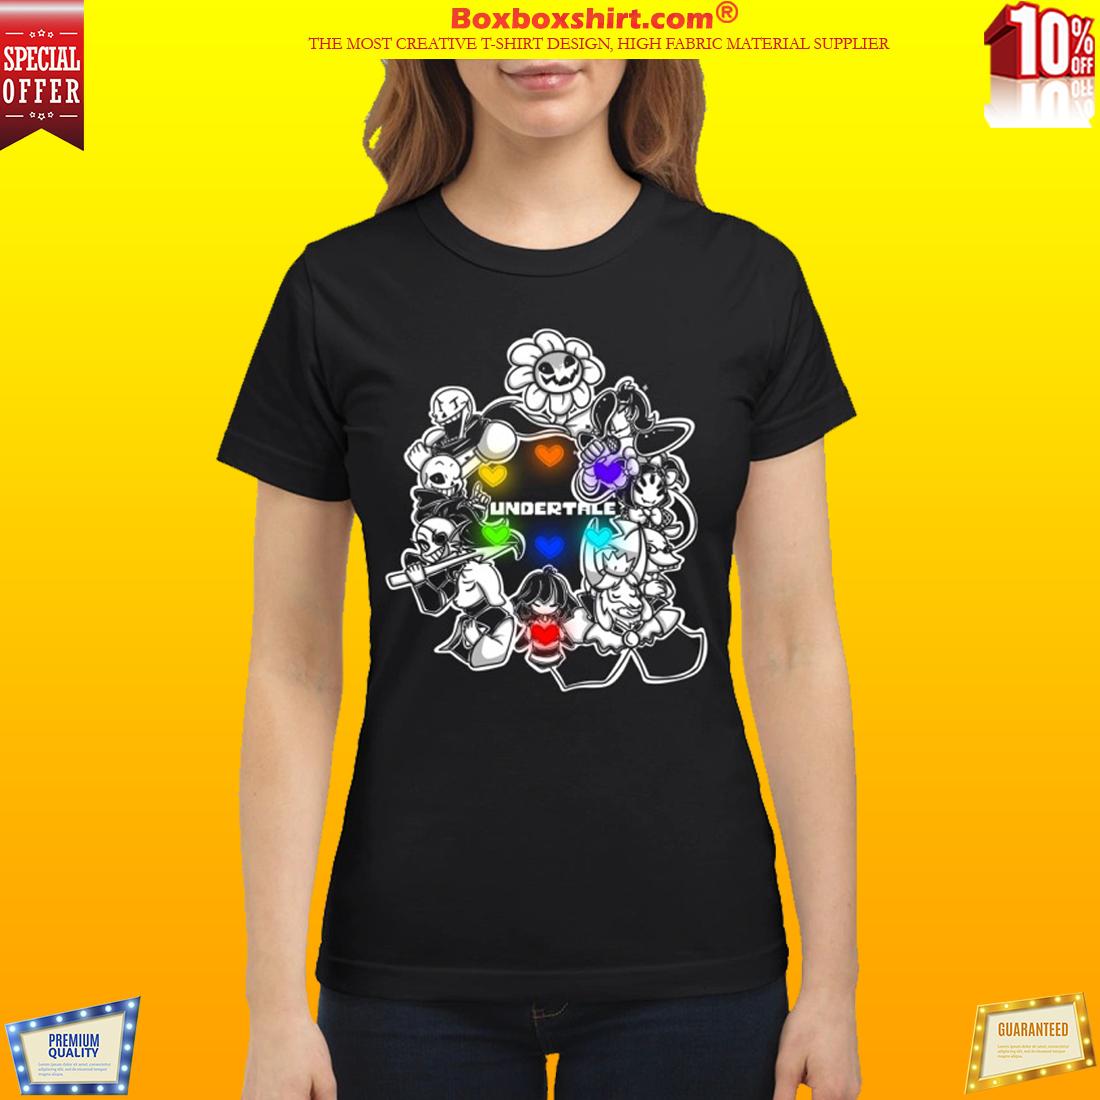 Undertale characters classic shirt